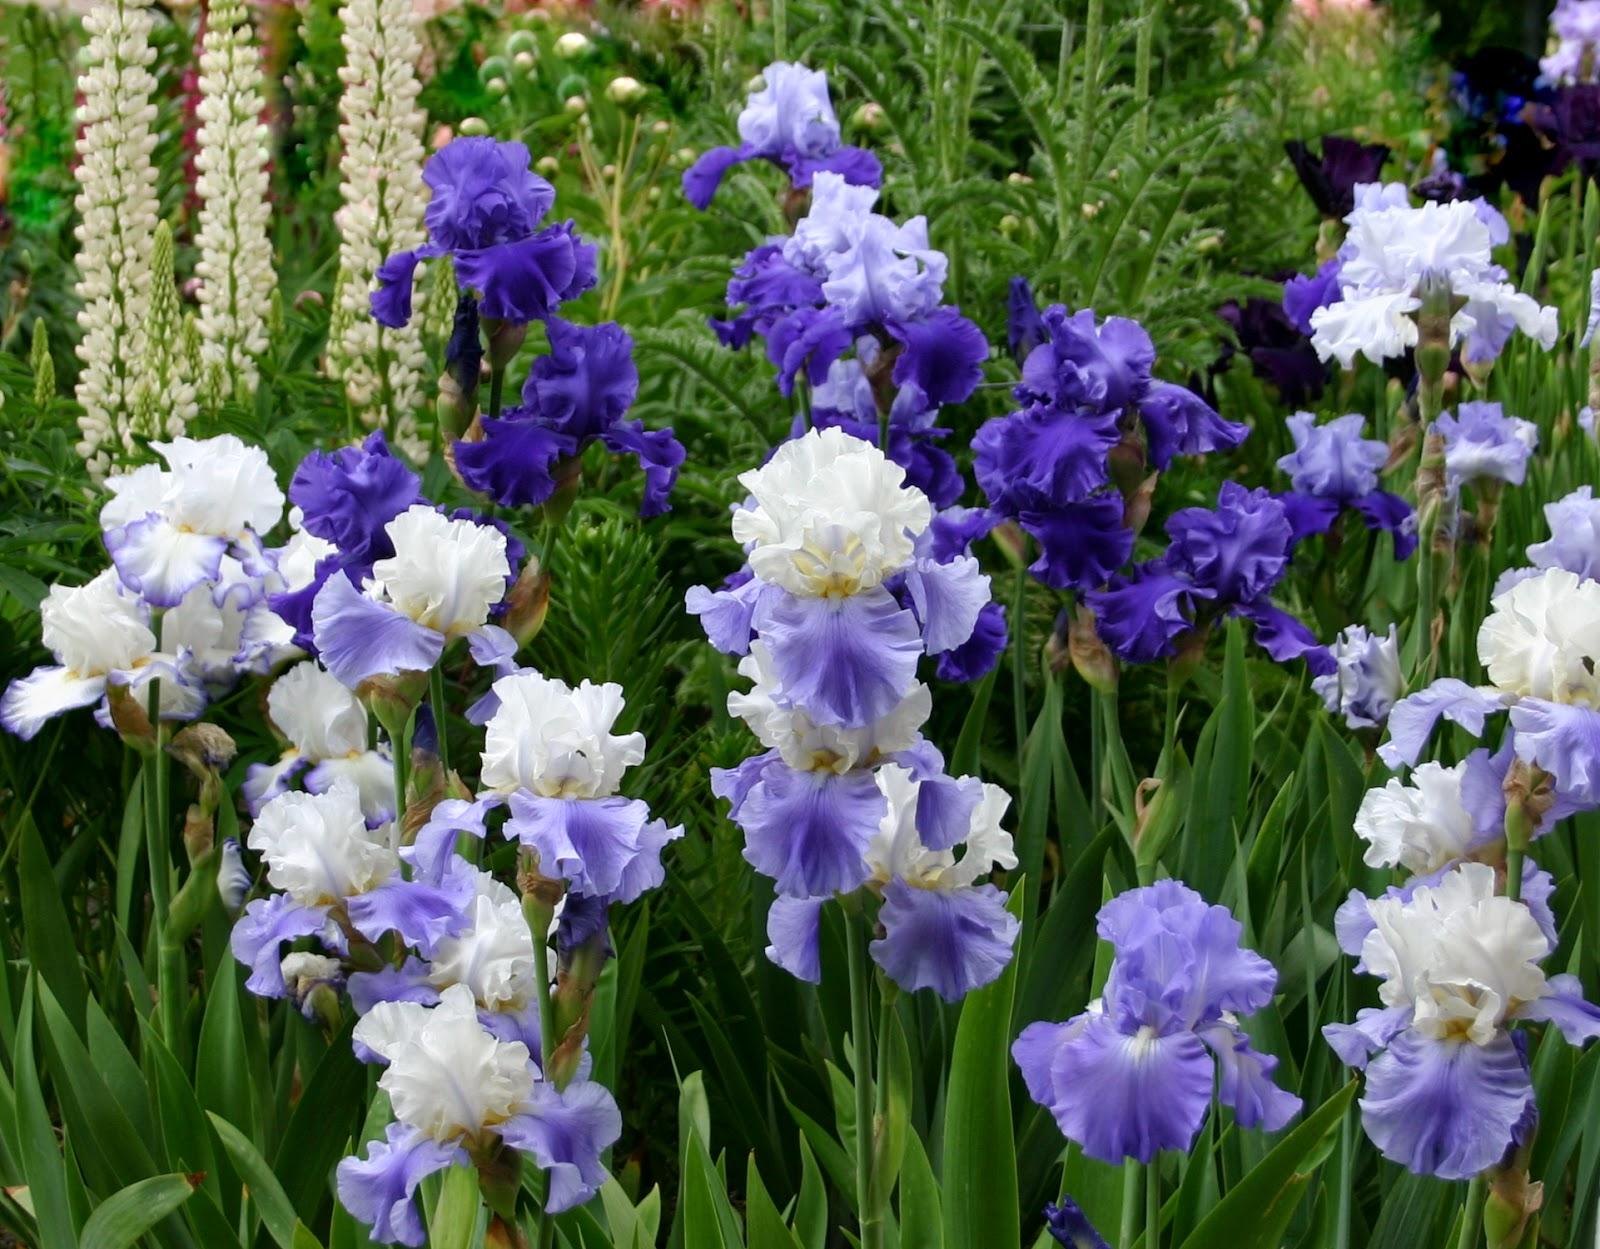 Iris flower garden garden visit flower borders in a colorful english world of irises quot talking irises quot the blue iris garden iris flower garden izmirmasajfo